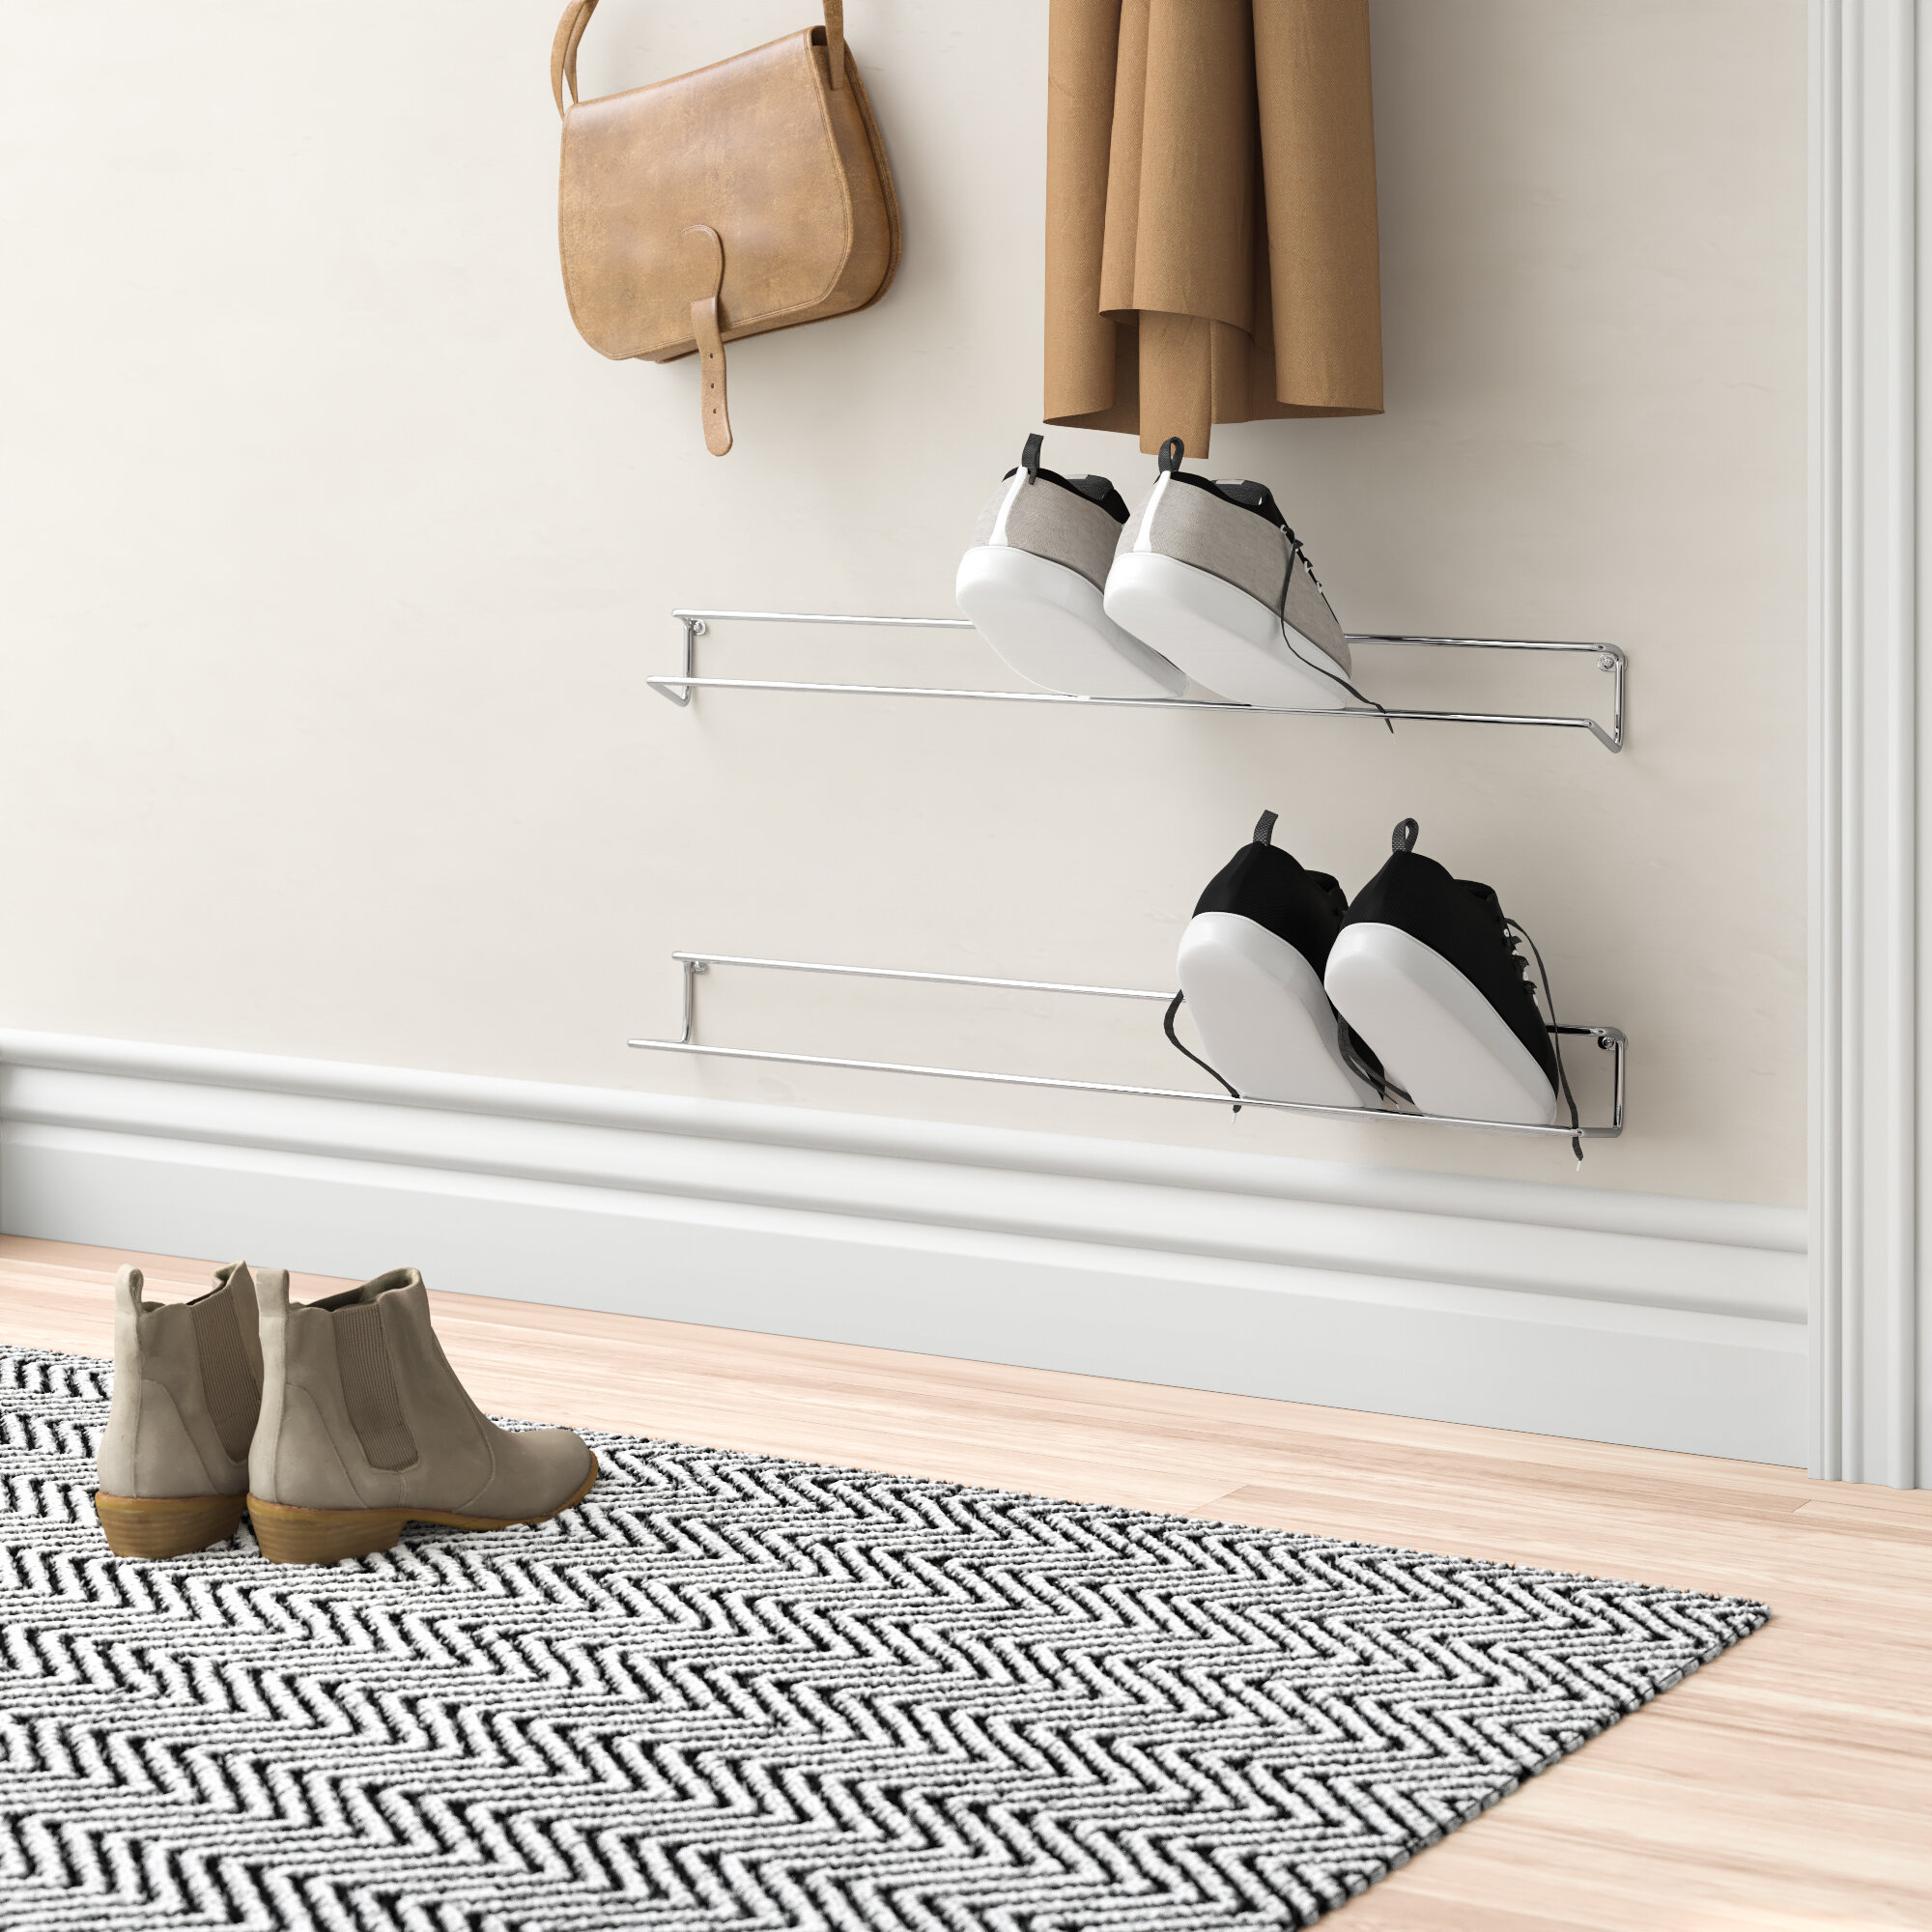 Mercury Row Wall Mounted Shoe Rack Reviews Wayfair Co Uk